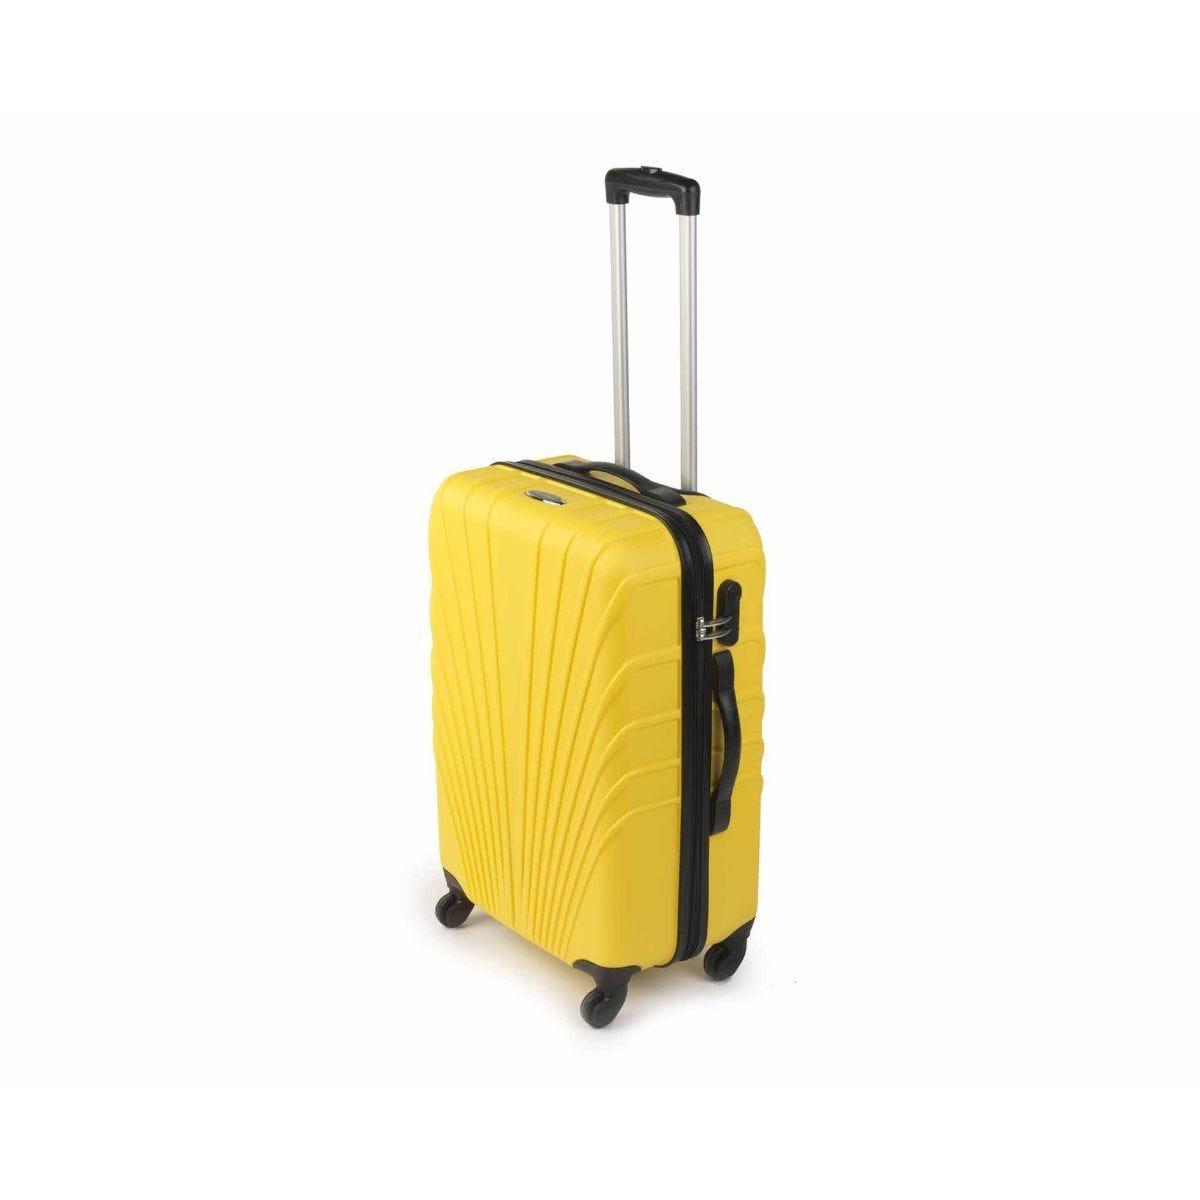 Constellation Medium 24 inch Arc ABS Suitcase Yellow